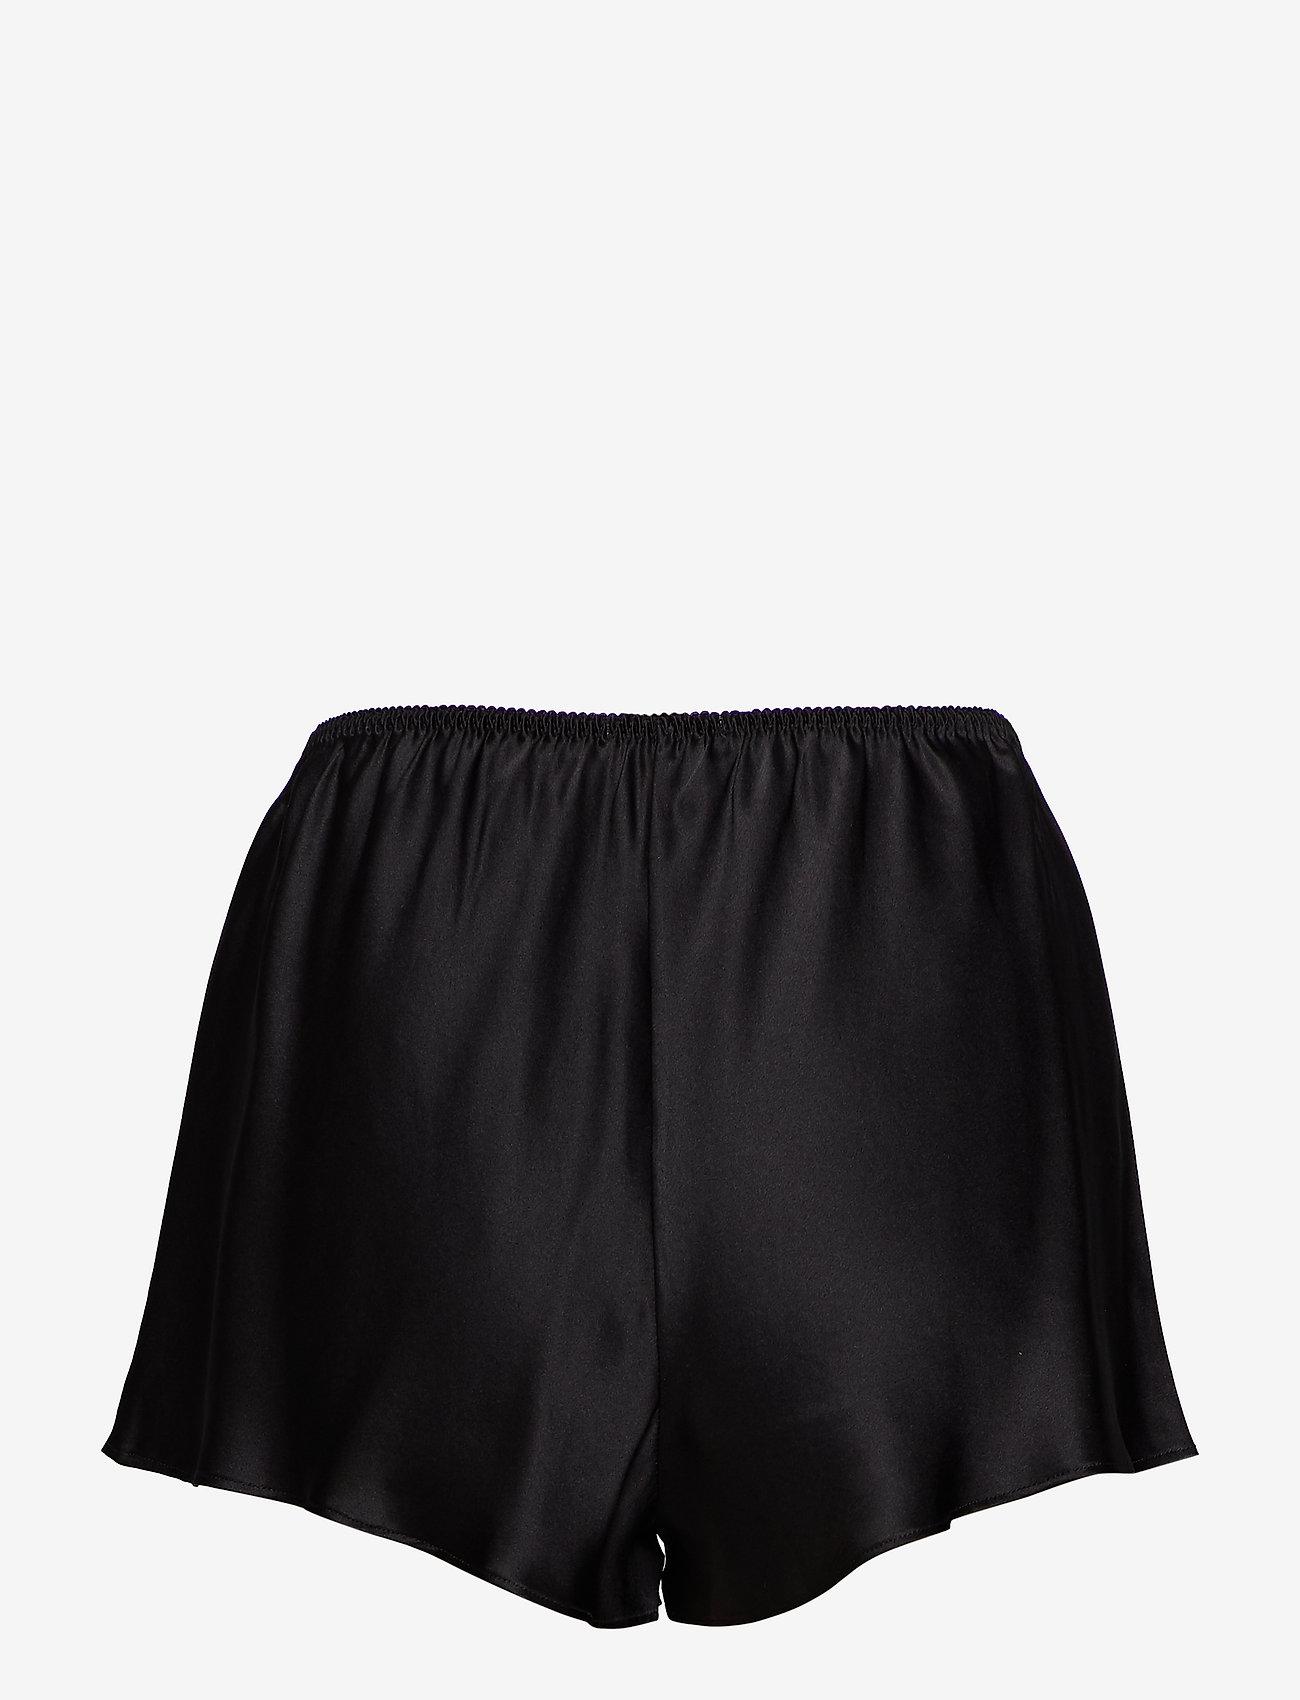 Lady Avenue - Pure Silk - French knickers - szorty - black - 1